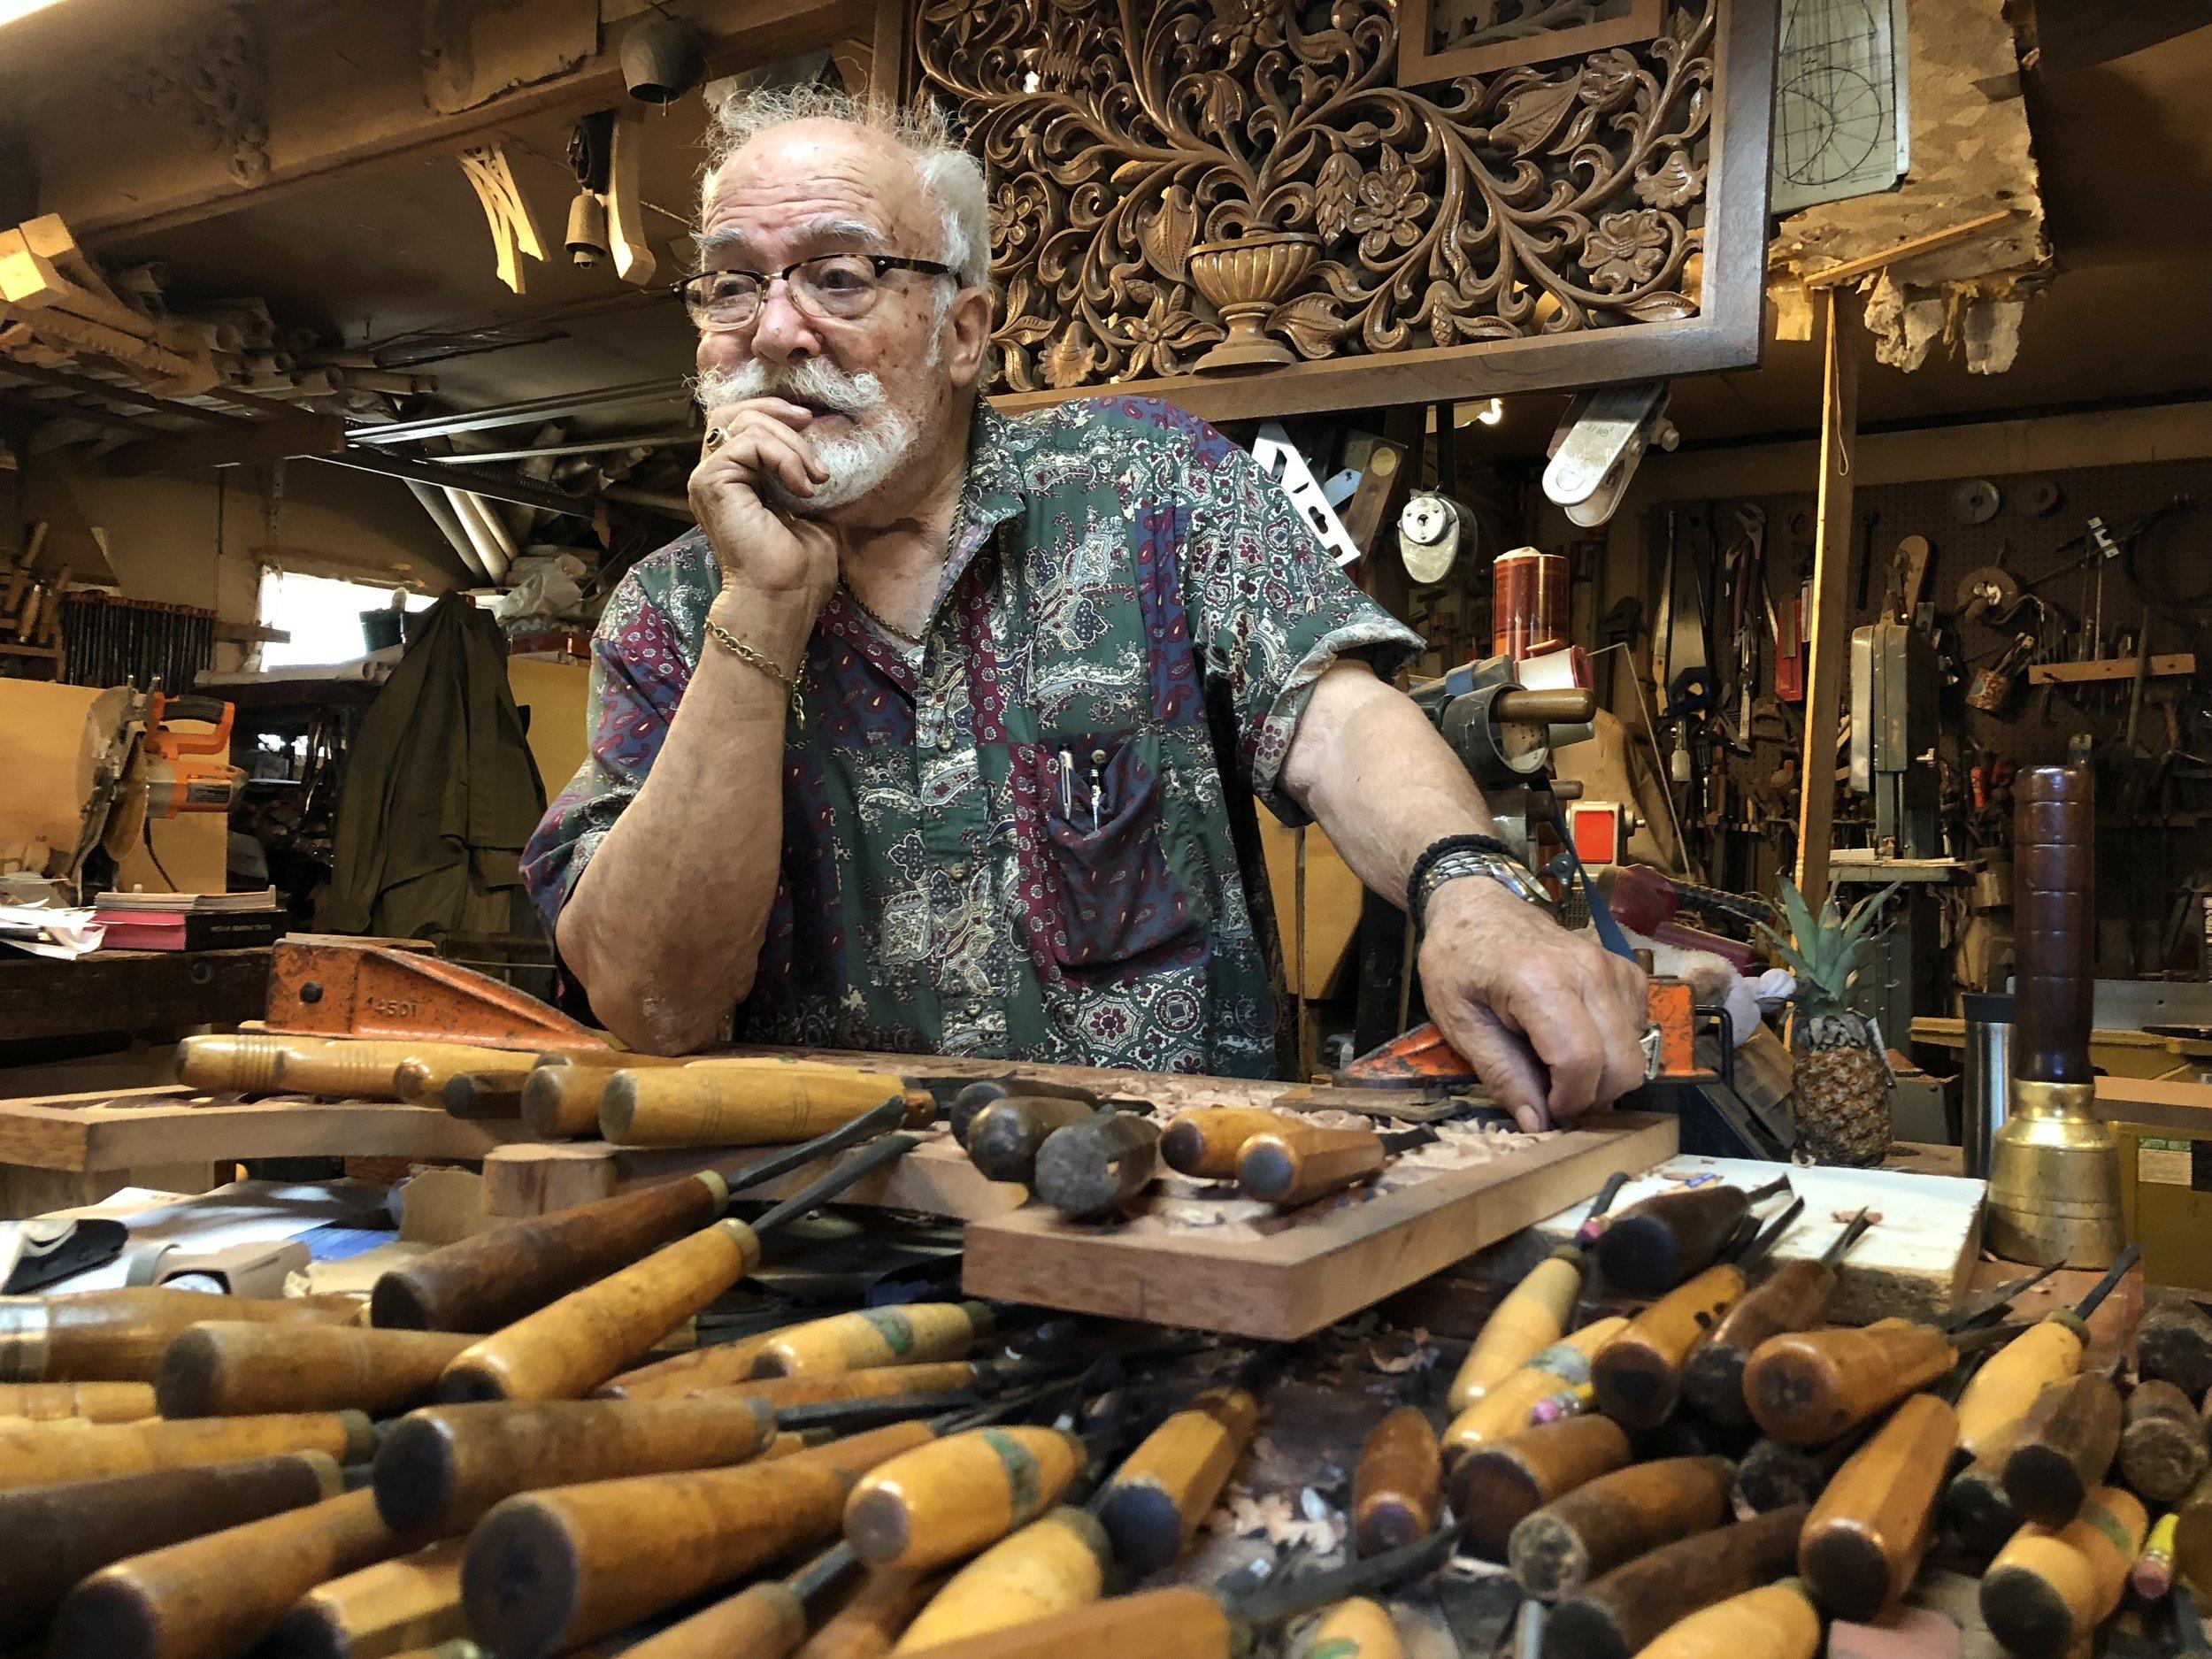 The Orthodox Wood Carver - Konstantinos Papadakis carves sacred artifacts